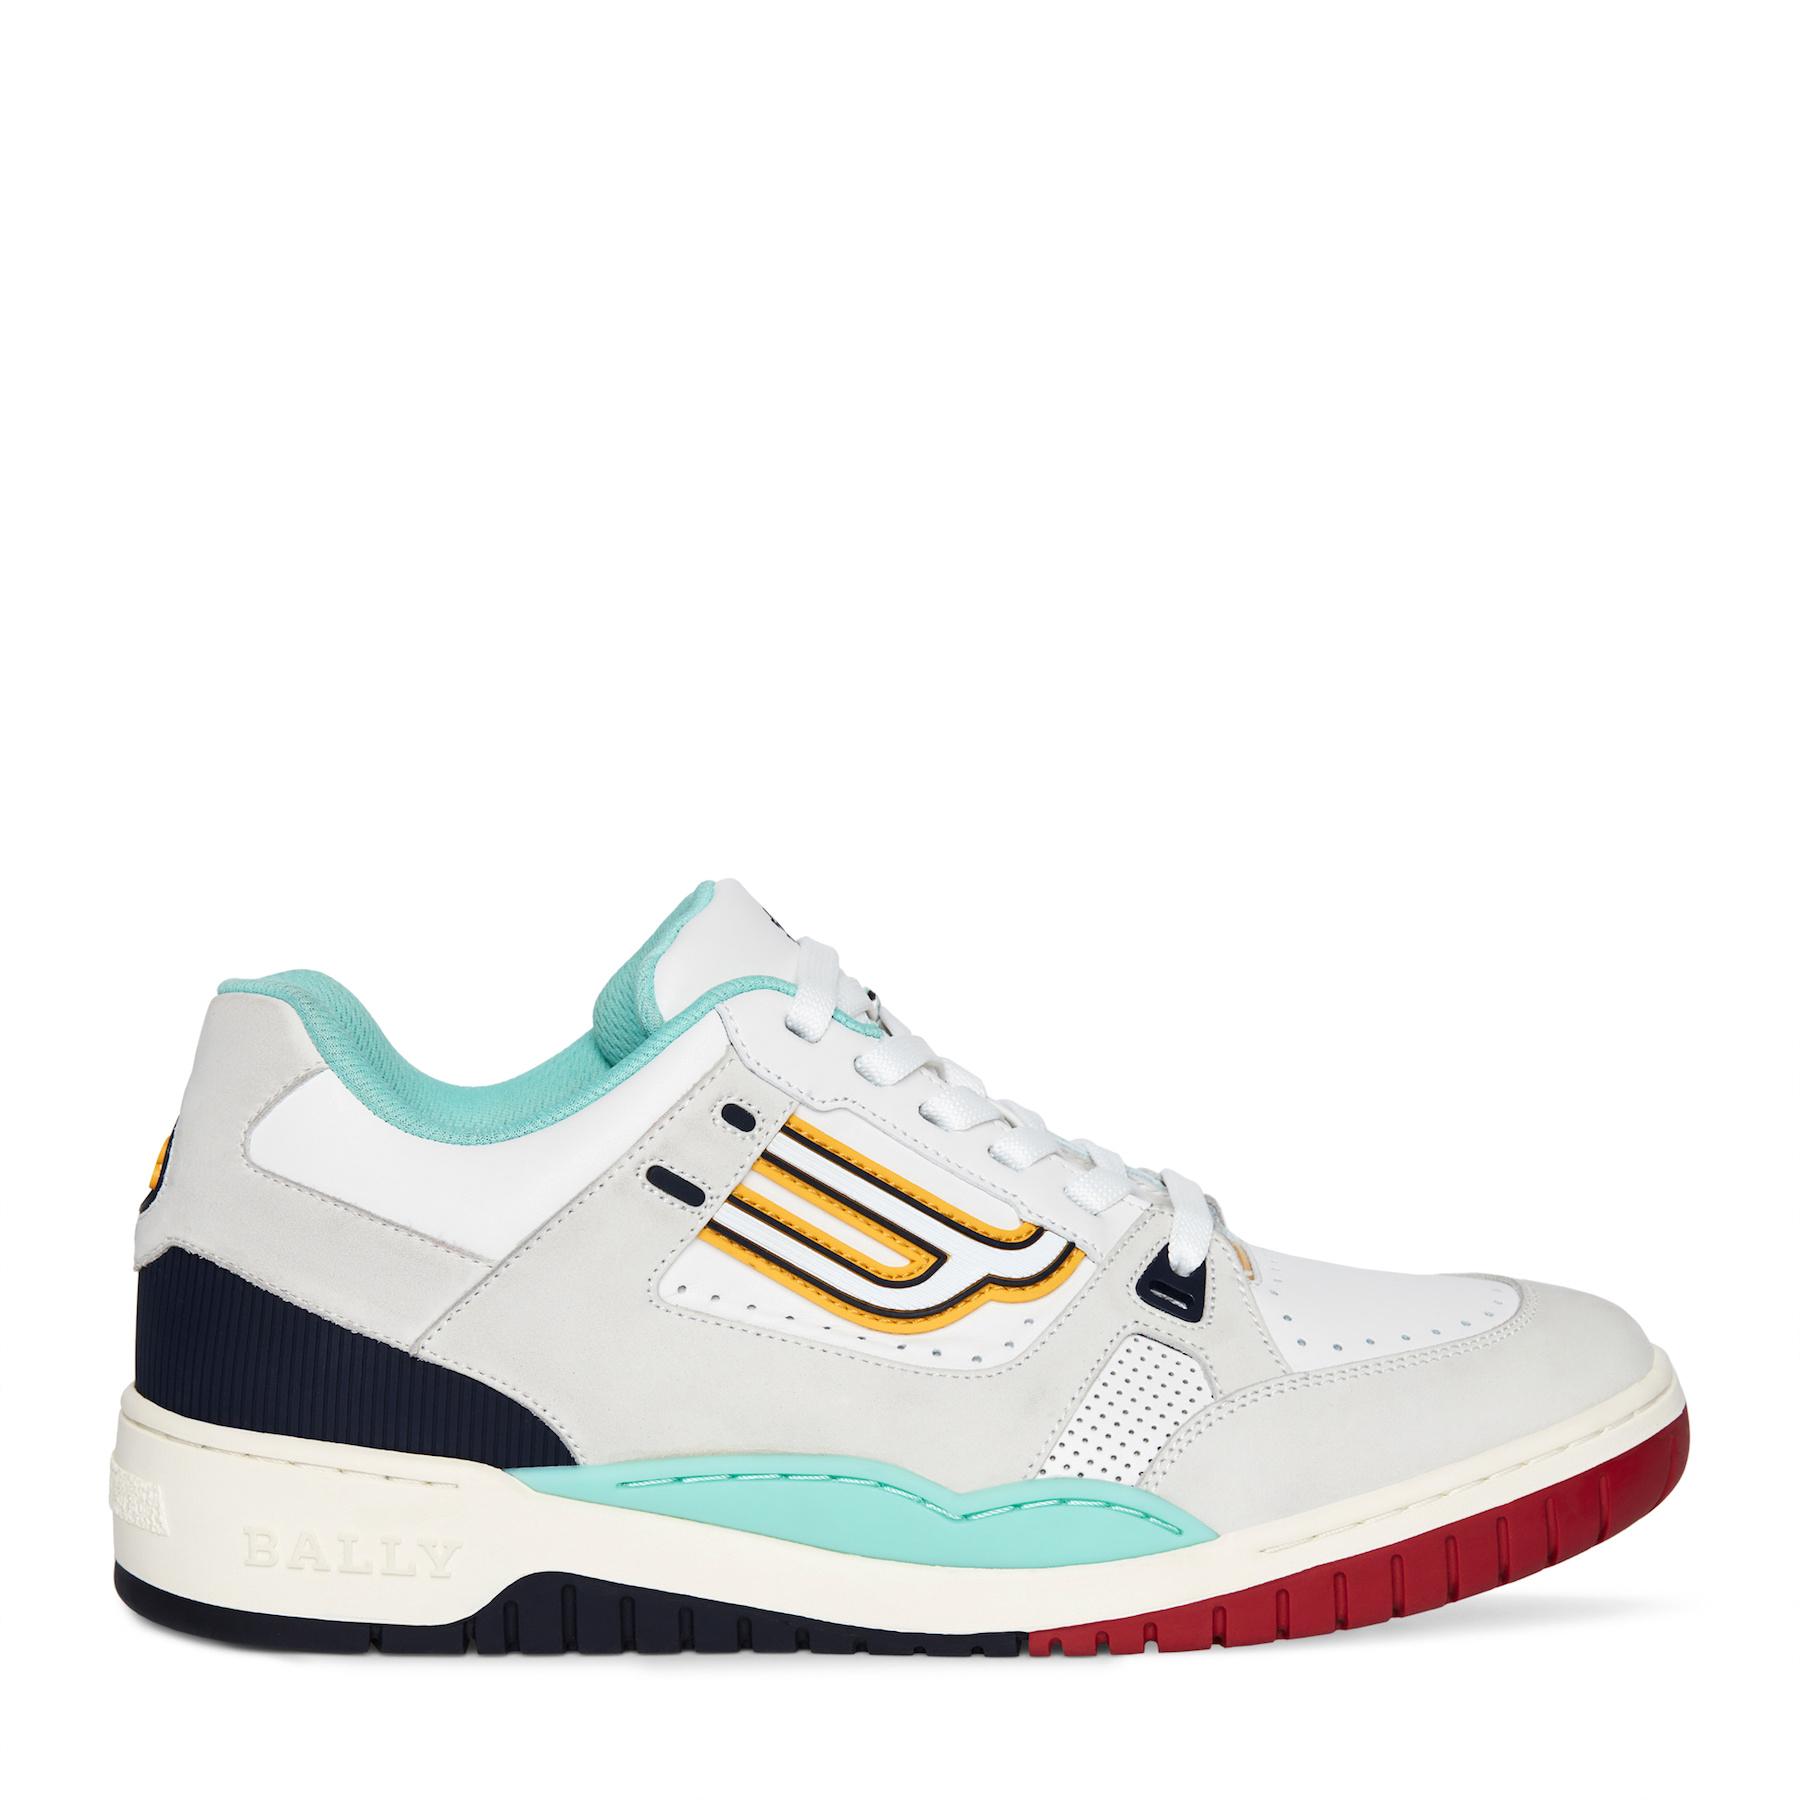 Bally Champion Sneaker_SS19 (replica of the 1991 Champion)_Online1.jpg